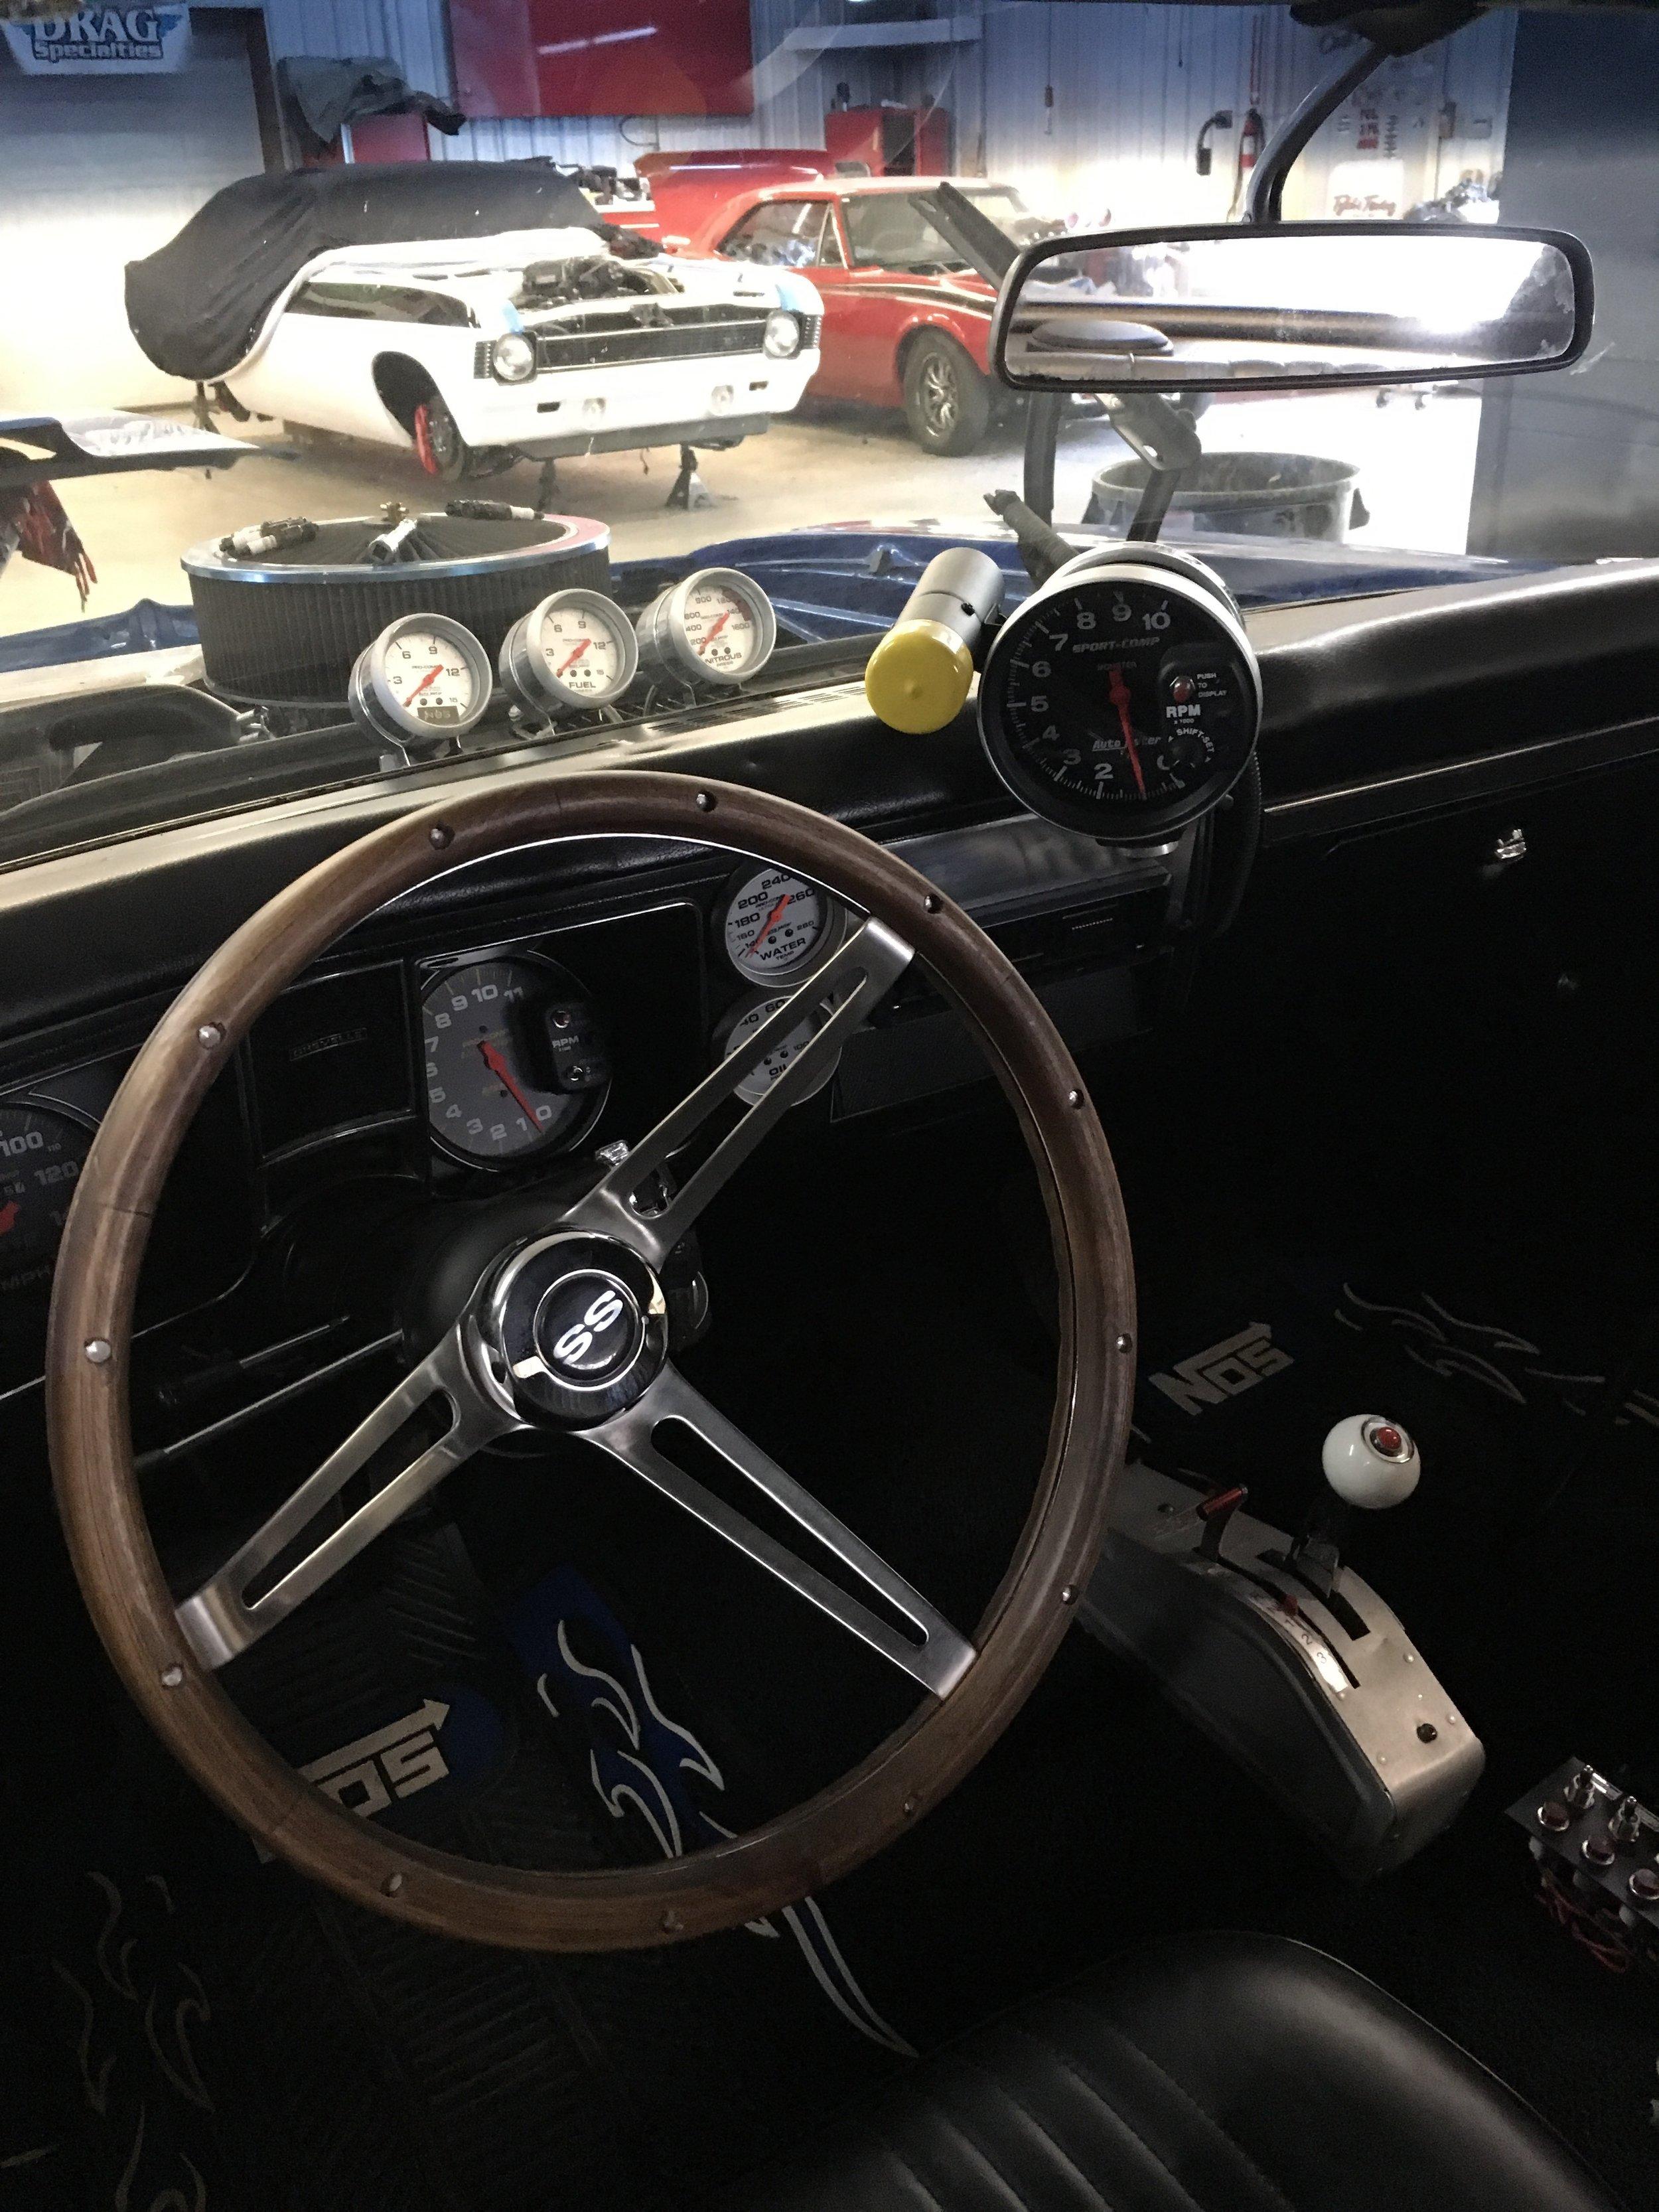 1968-chevelle-yenko-minneapolis-hot-rod-factory-car-restoration-interior.jpg